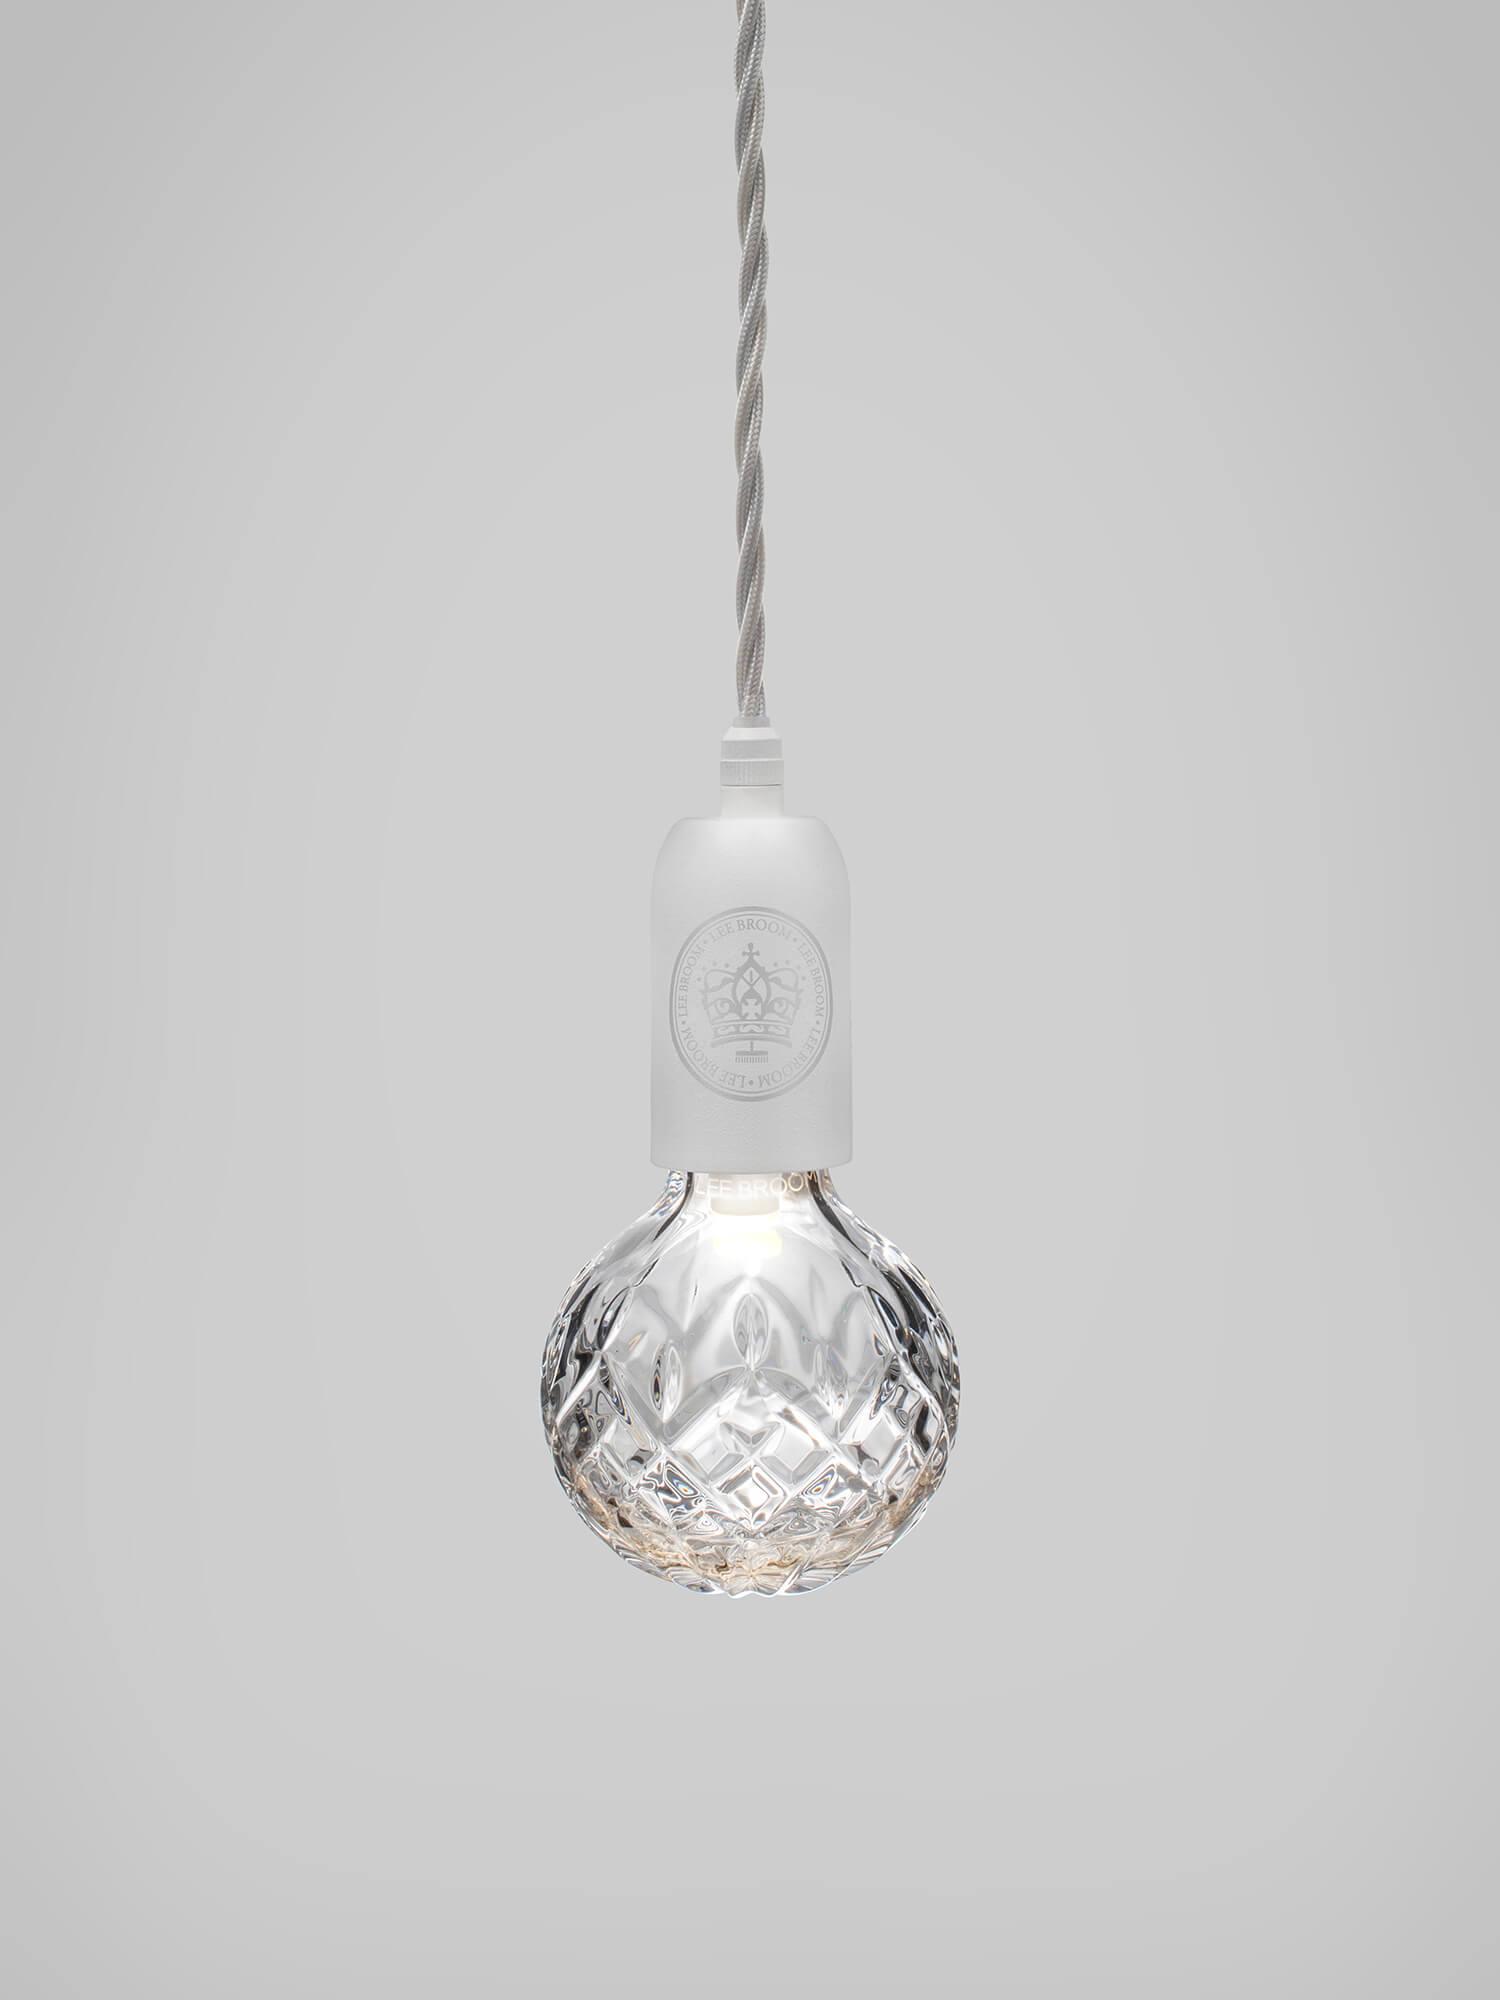 est living lee broom 10 Year Crystal bulb